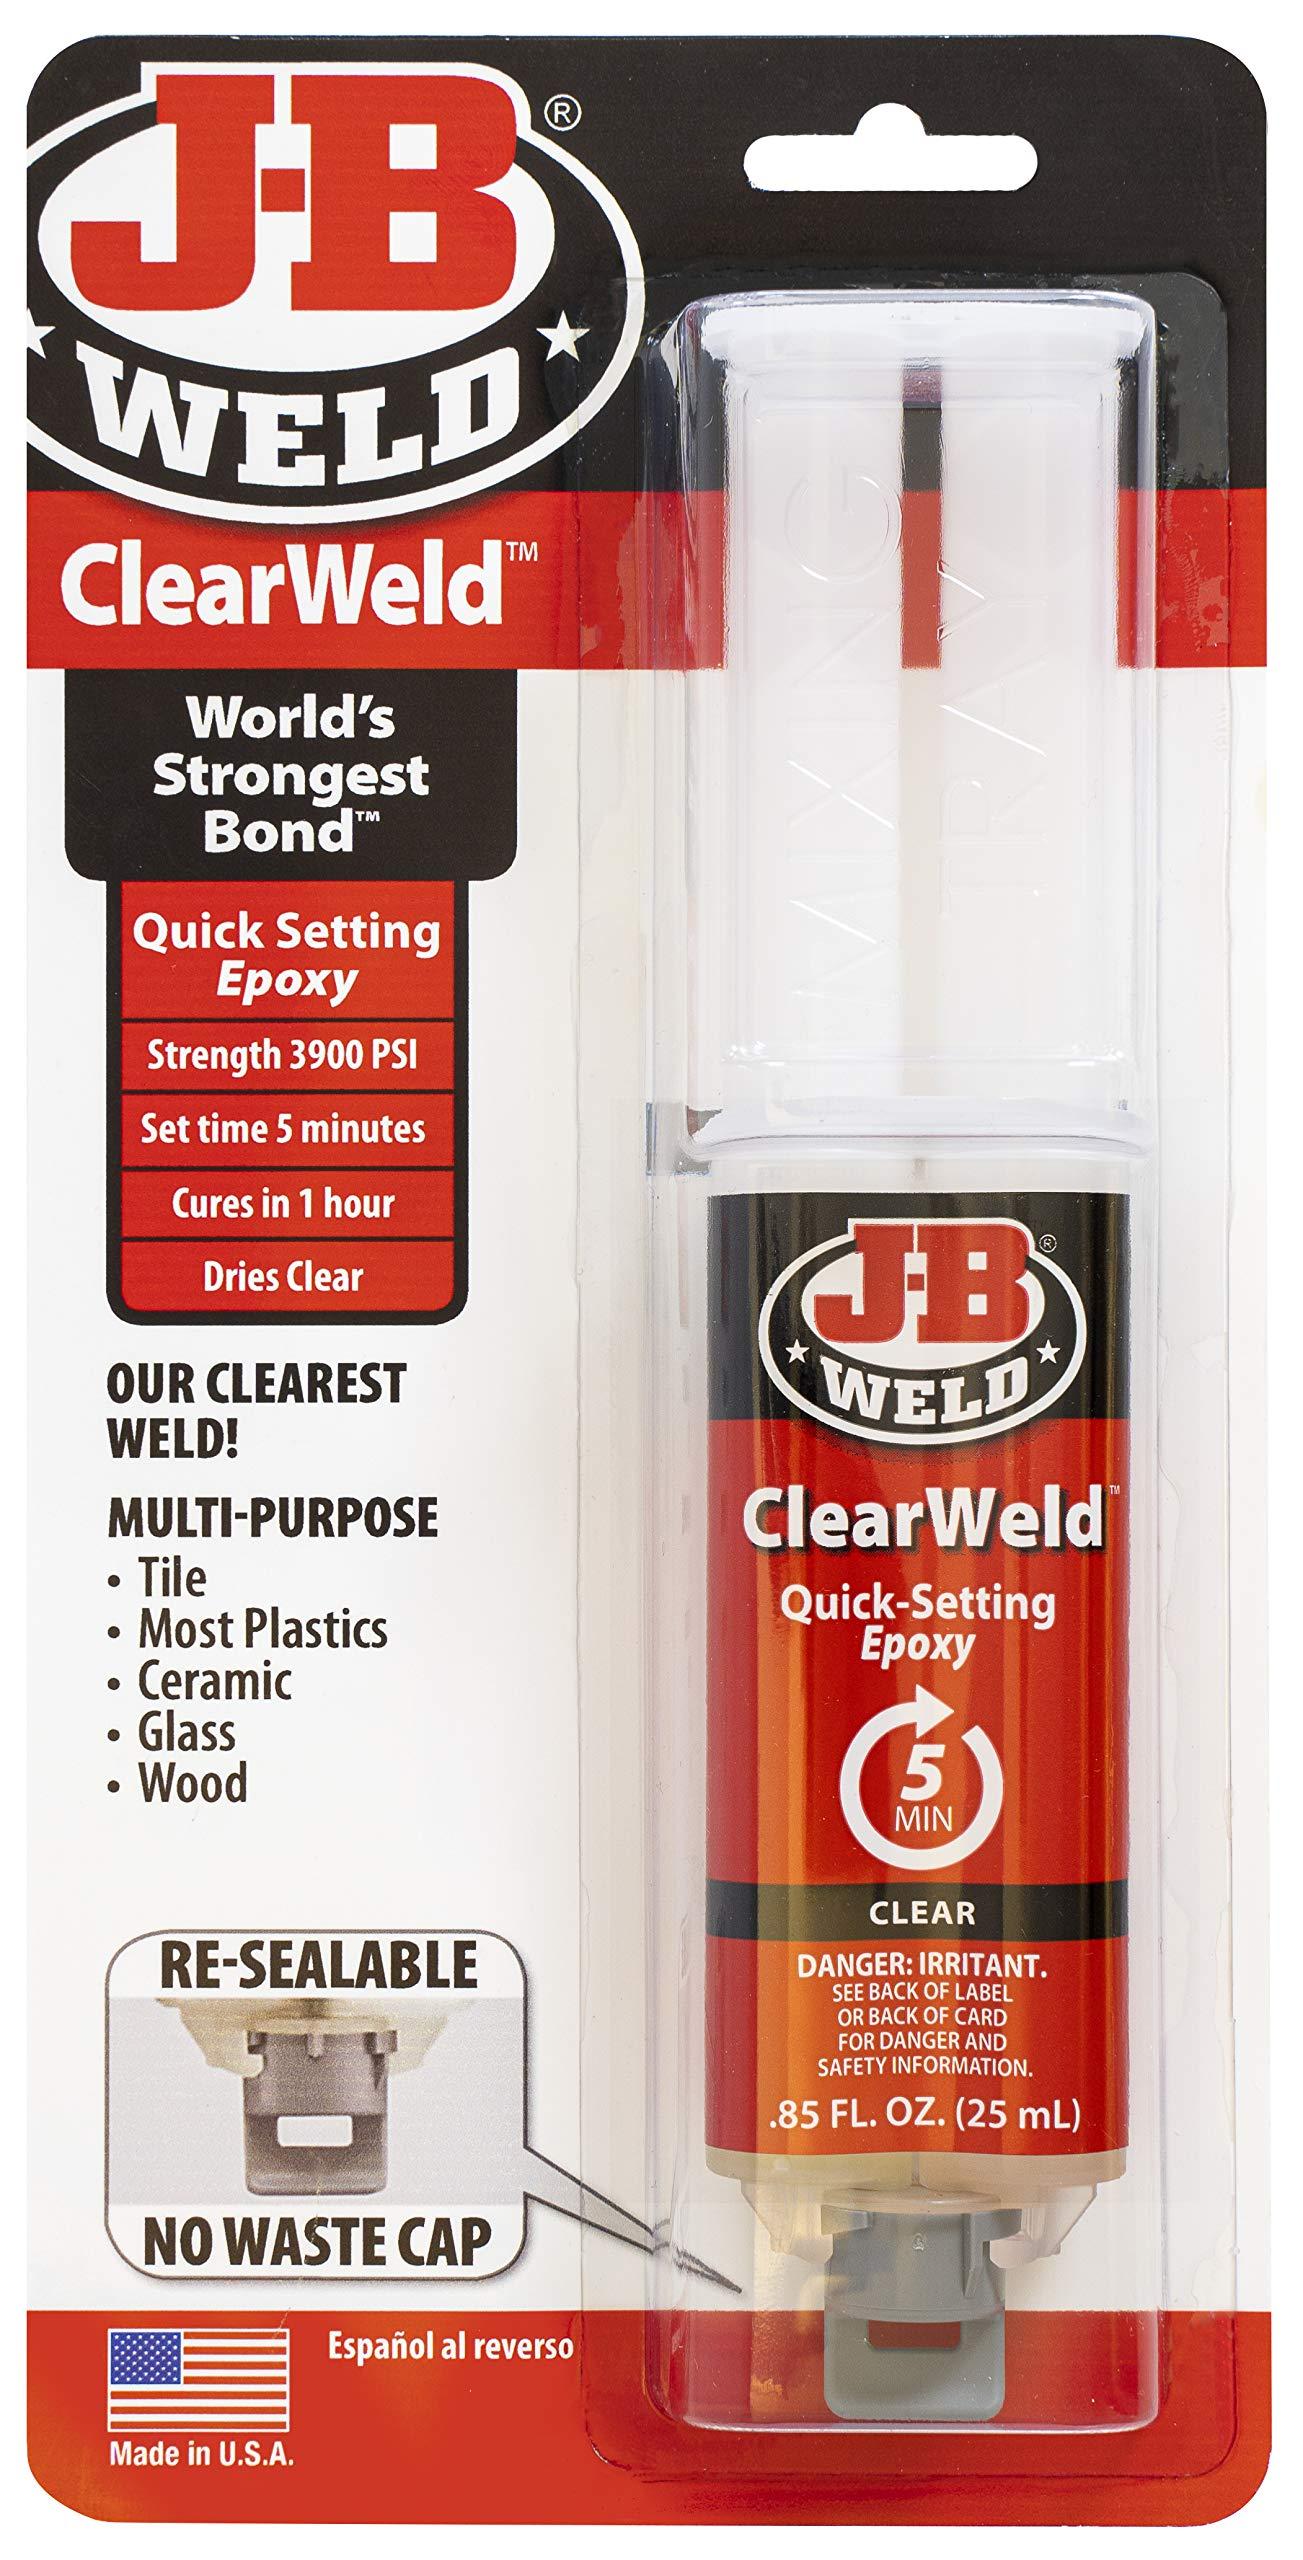 J-B Weld 50112 ClearWeld Epoxy